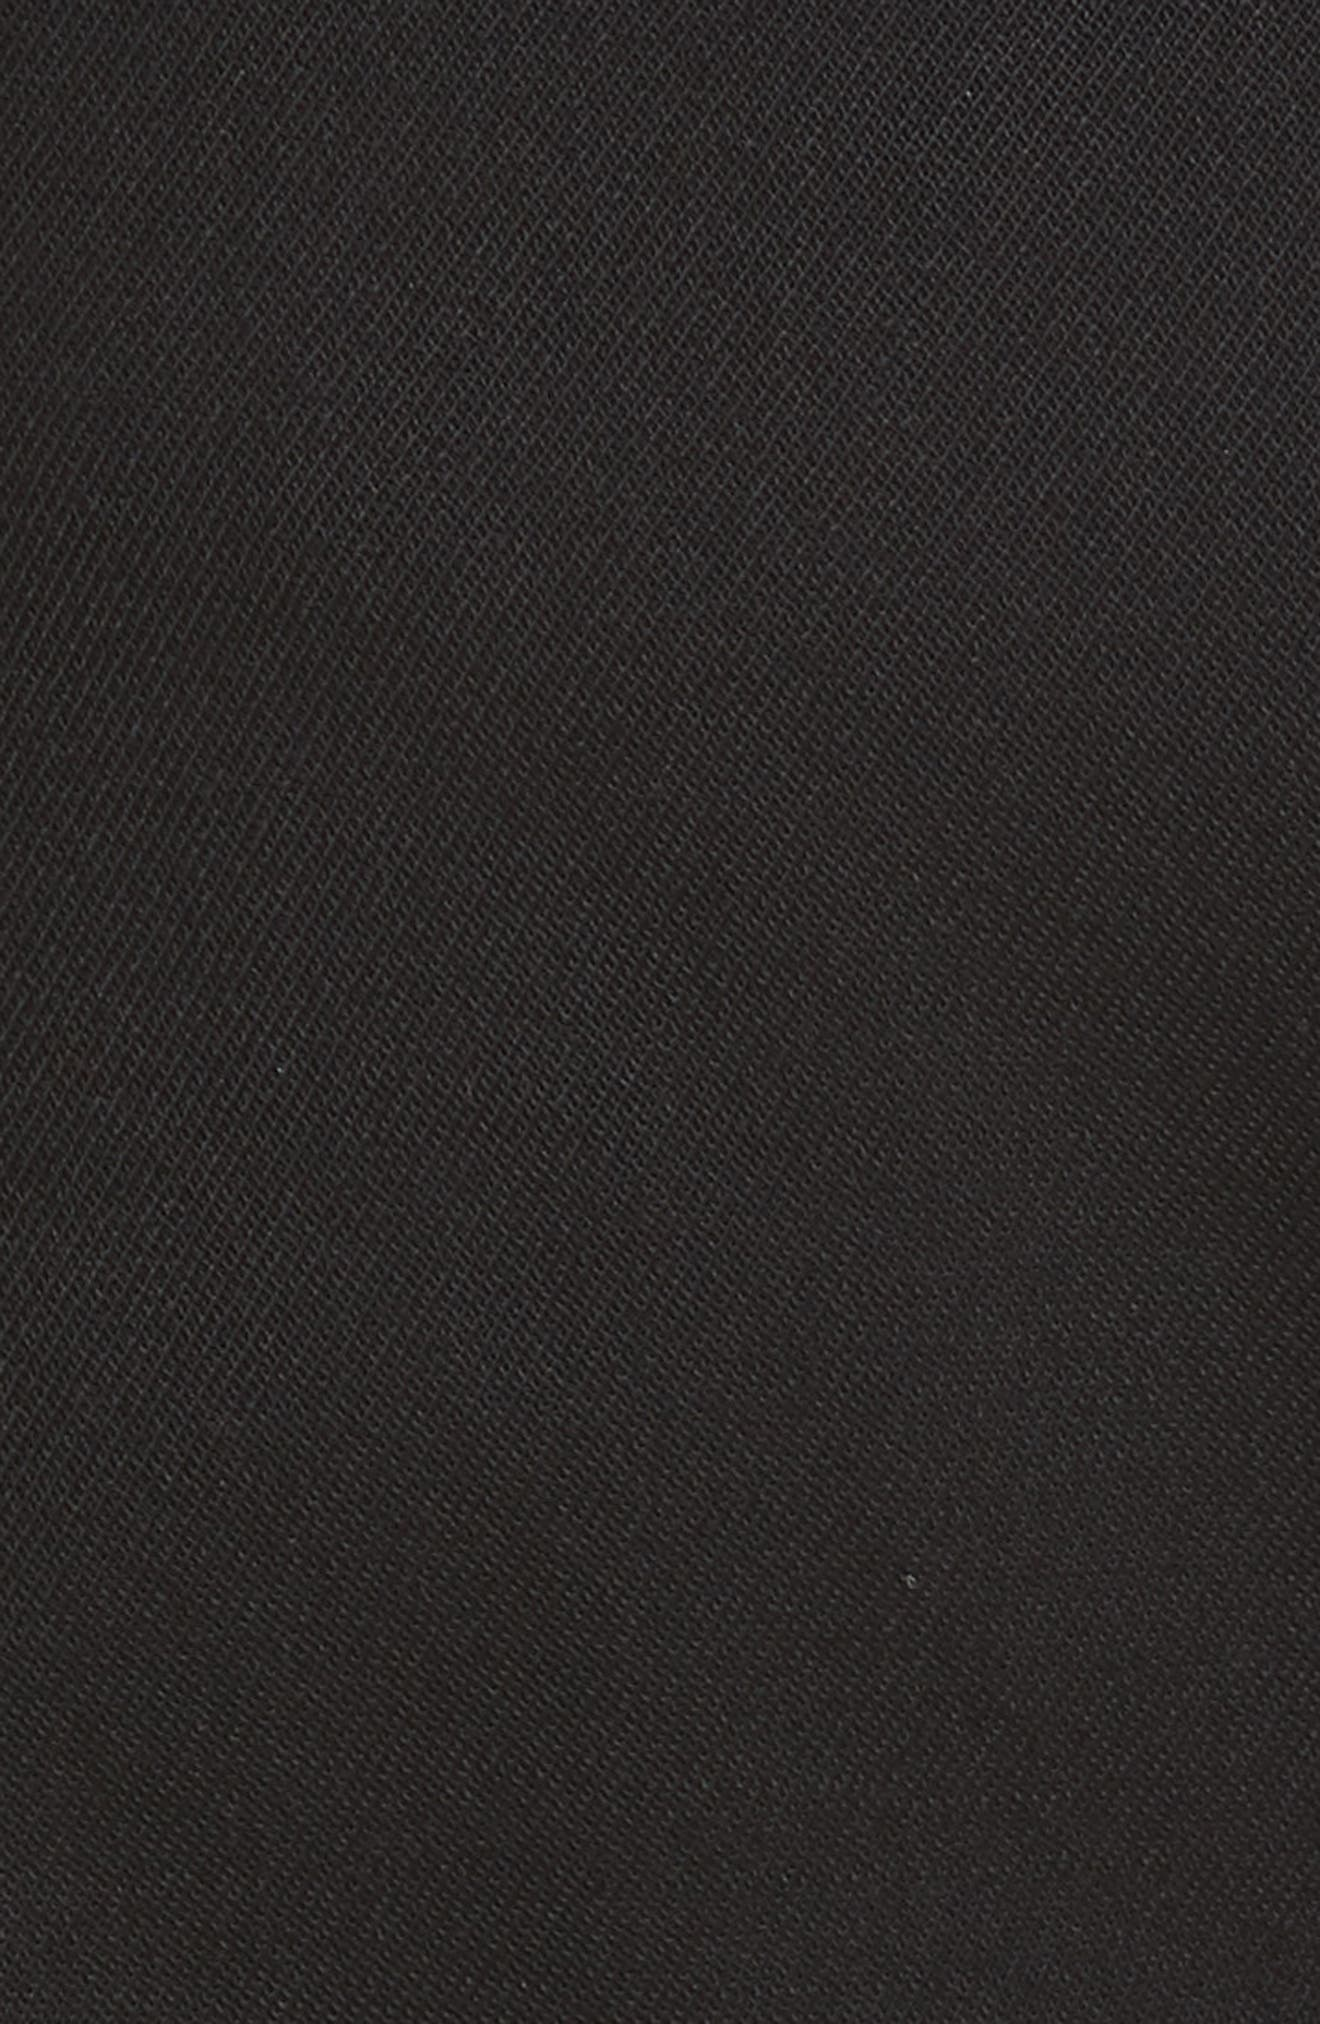 Side Zip Detail Suiting Pants,                             Alternate thumbnail 5, color,                             001